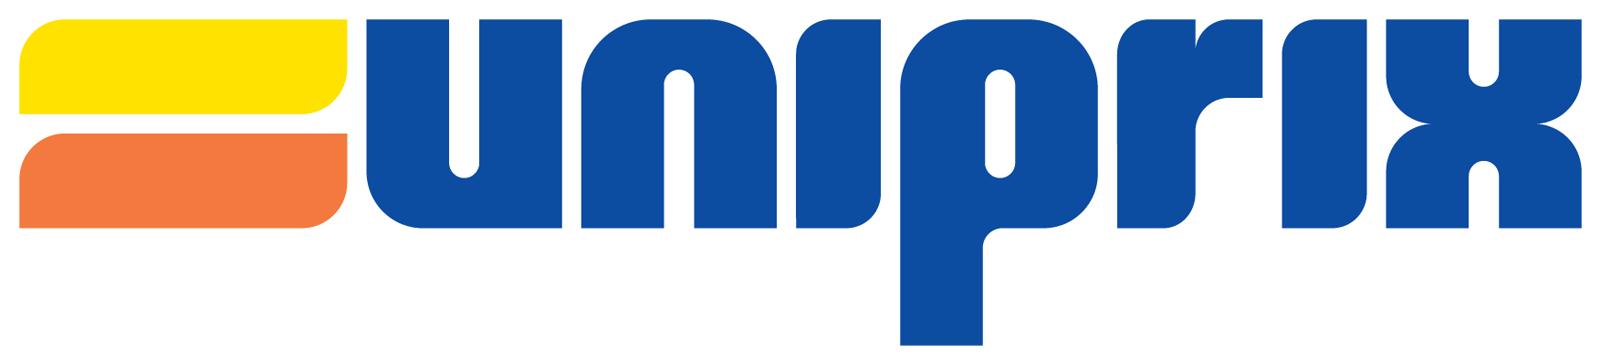 premier logo uniprix (brun)